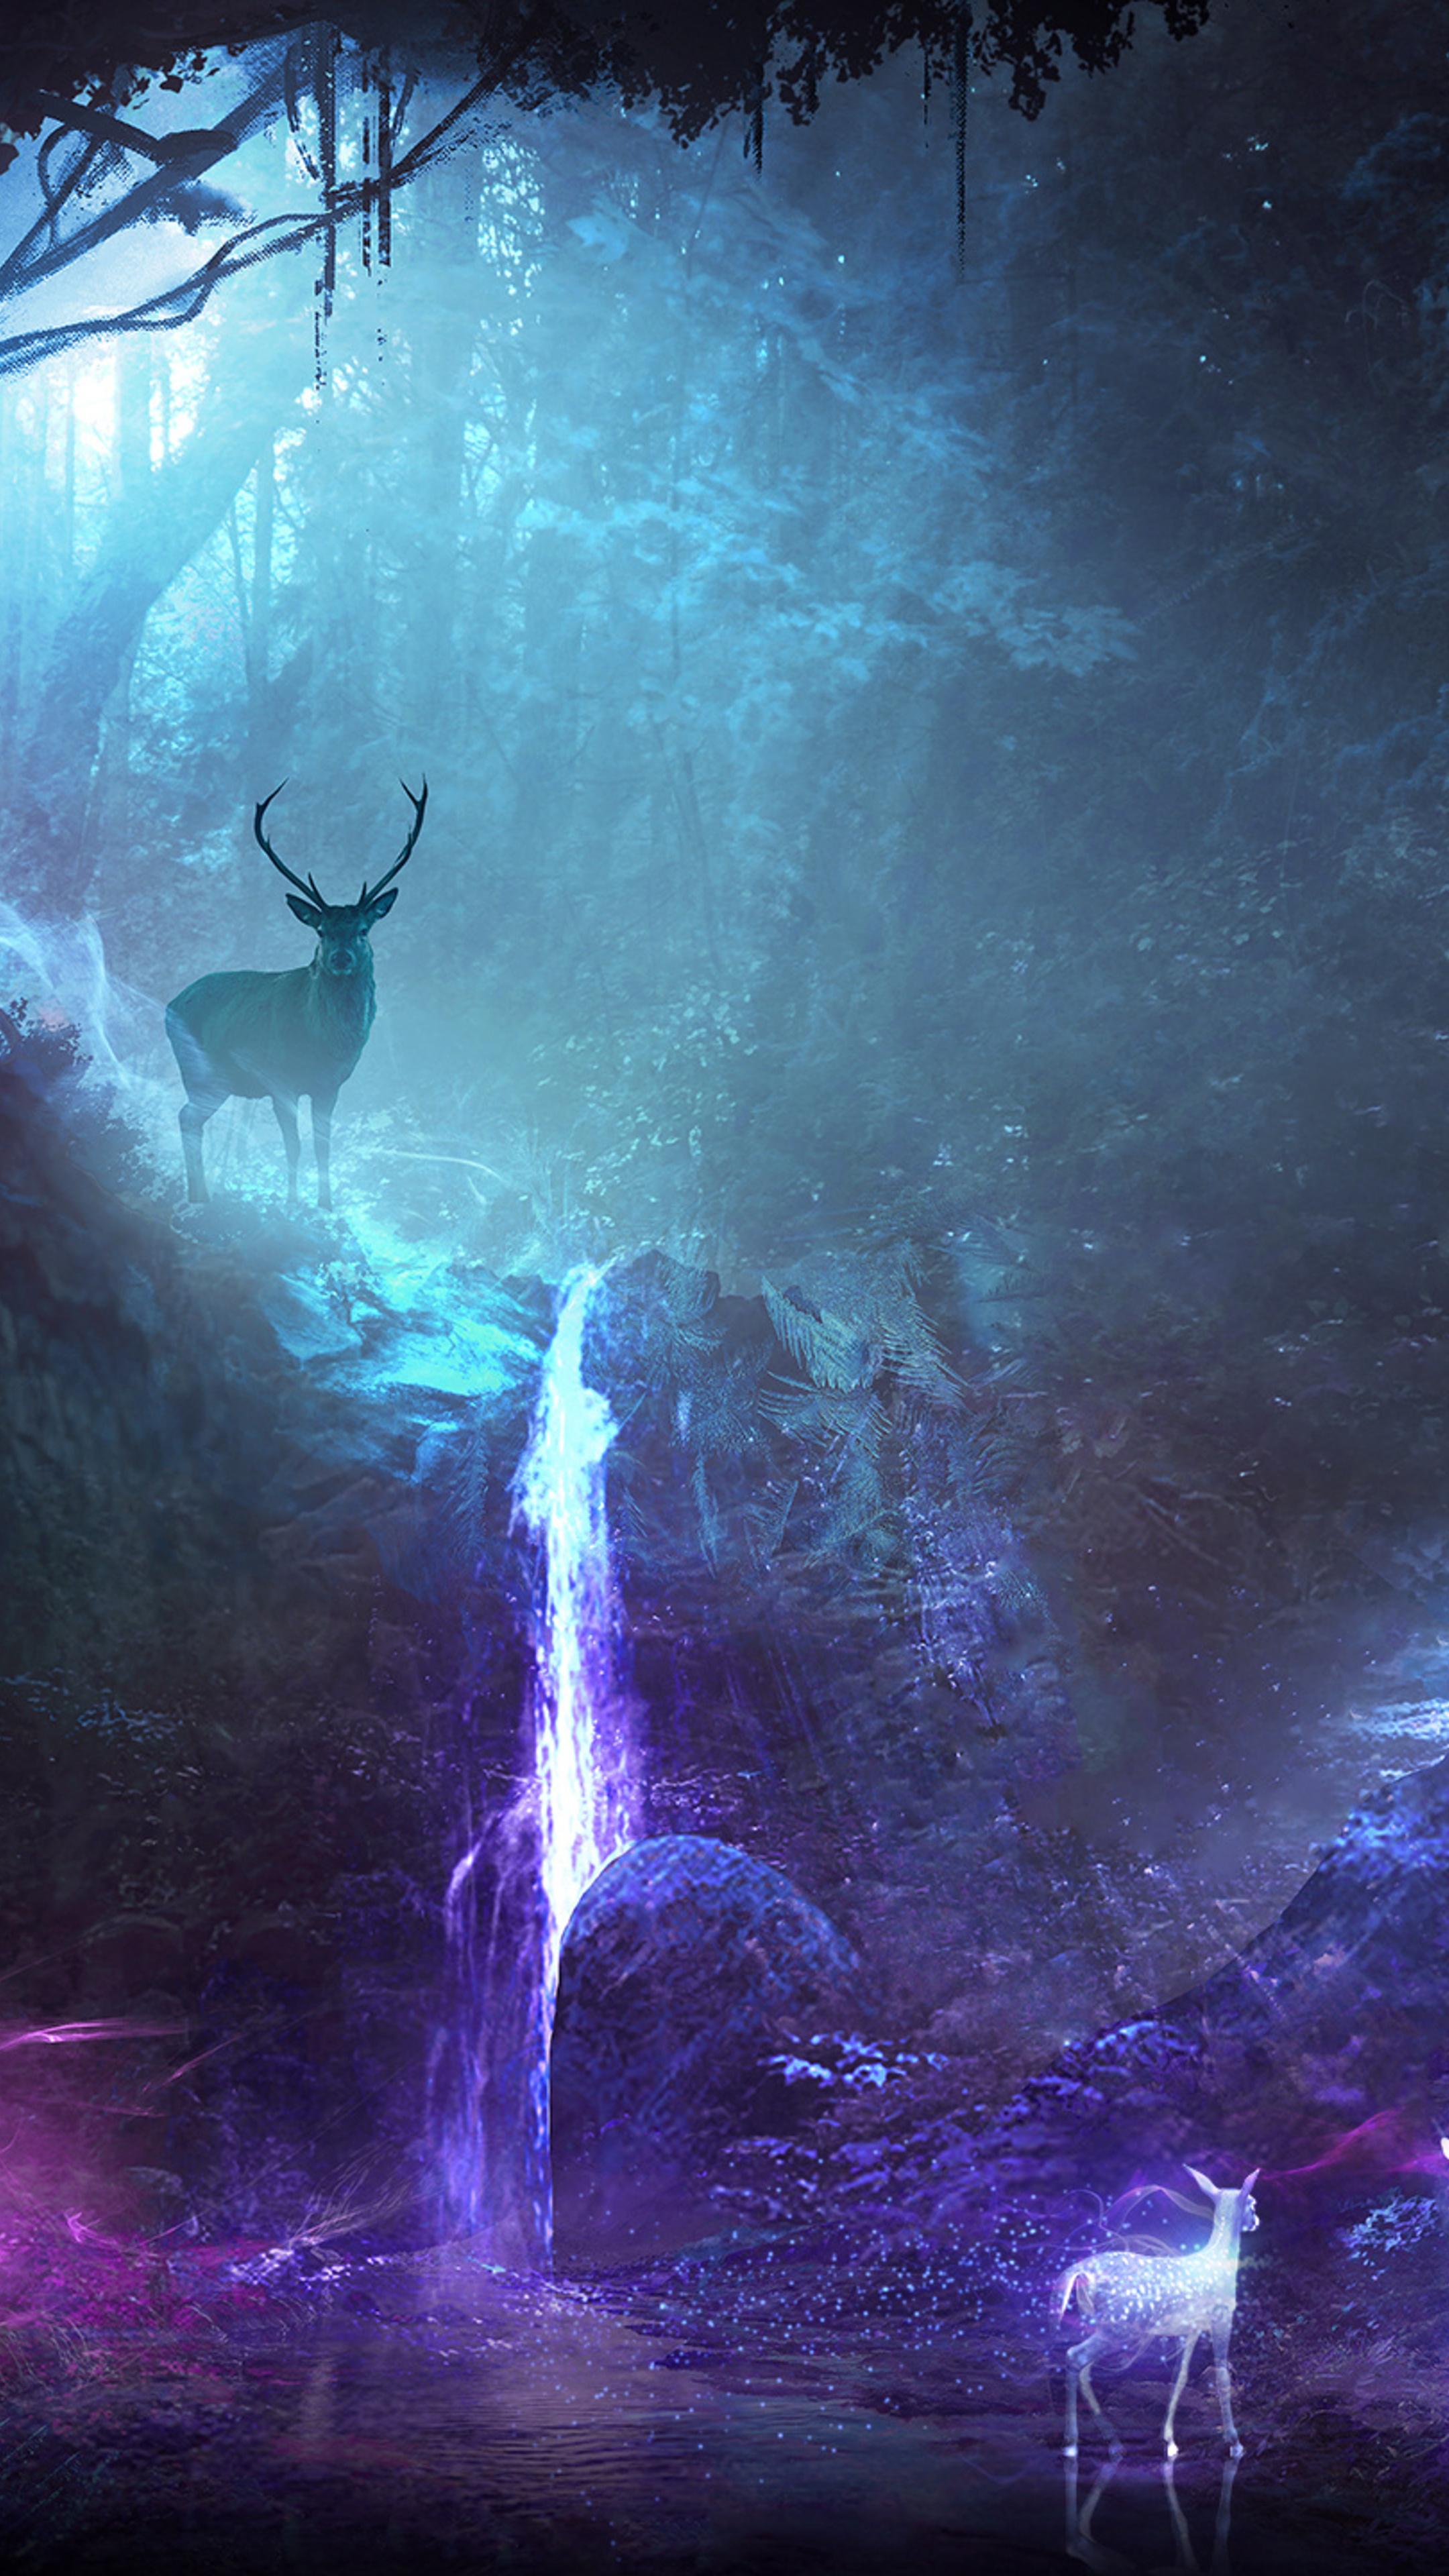 Popular Wallpaper Animal Night - deer-animal-night-fantasy-waterfall-65-2160x3840  Trends_795418      .jpg